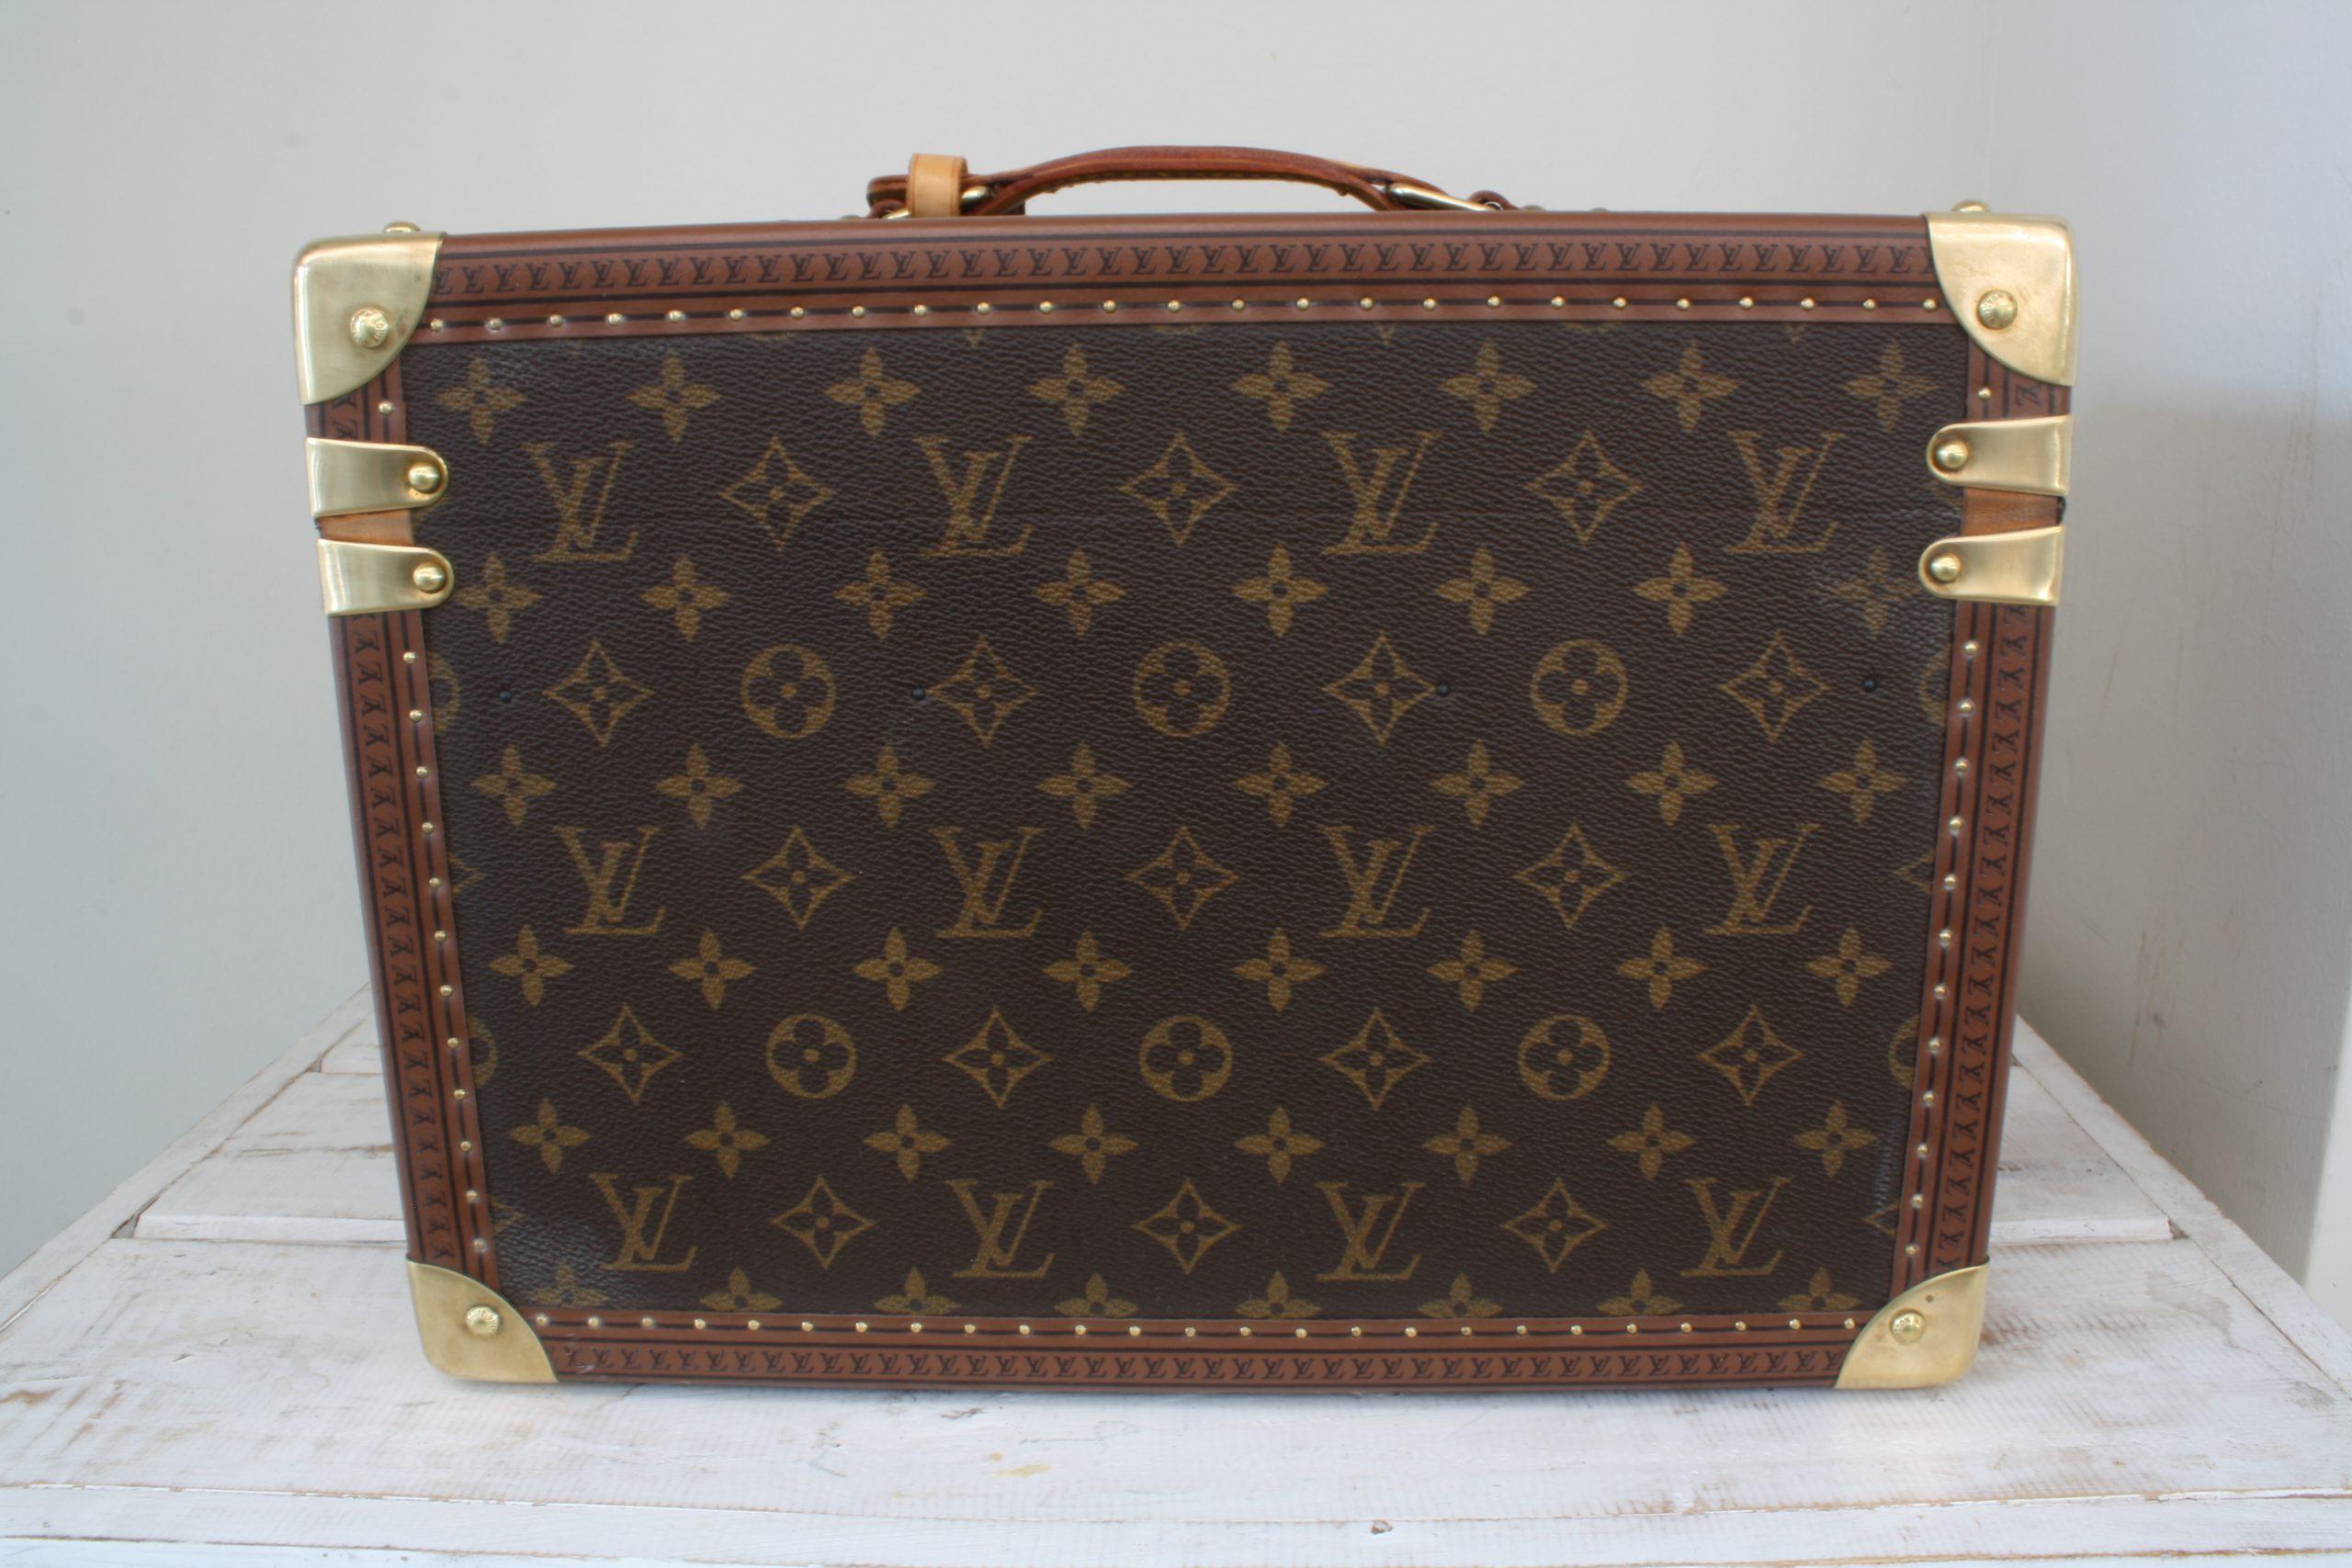 vintage-louis-vuitton-large-vanity-case-back-side